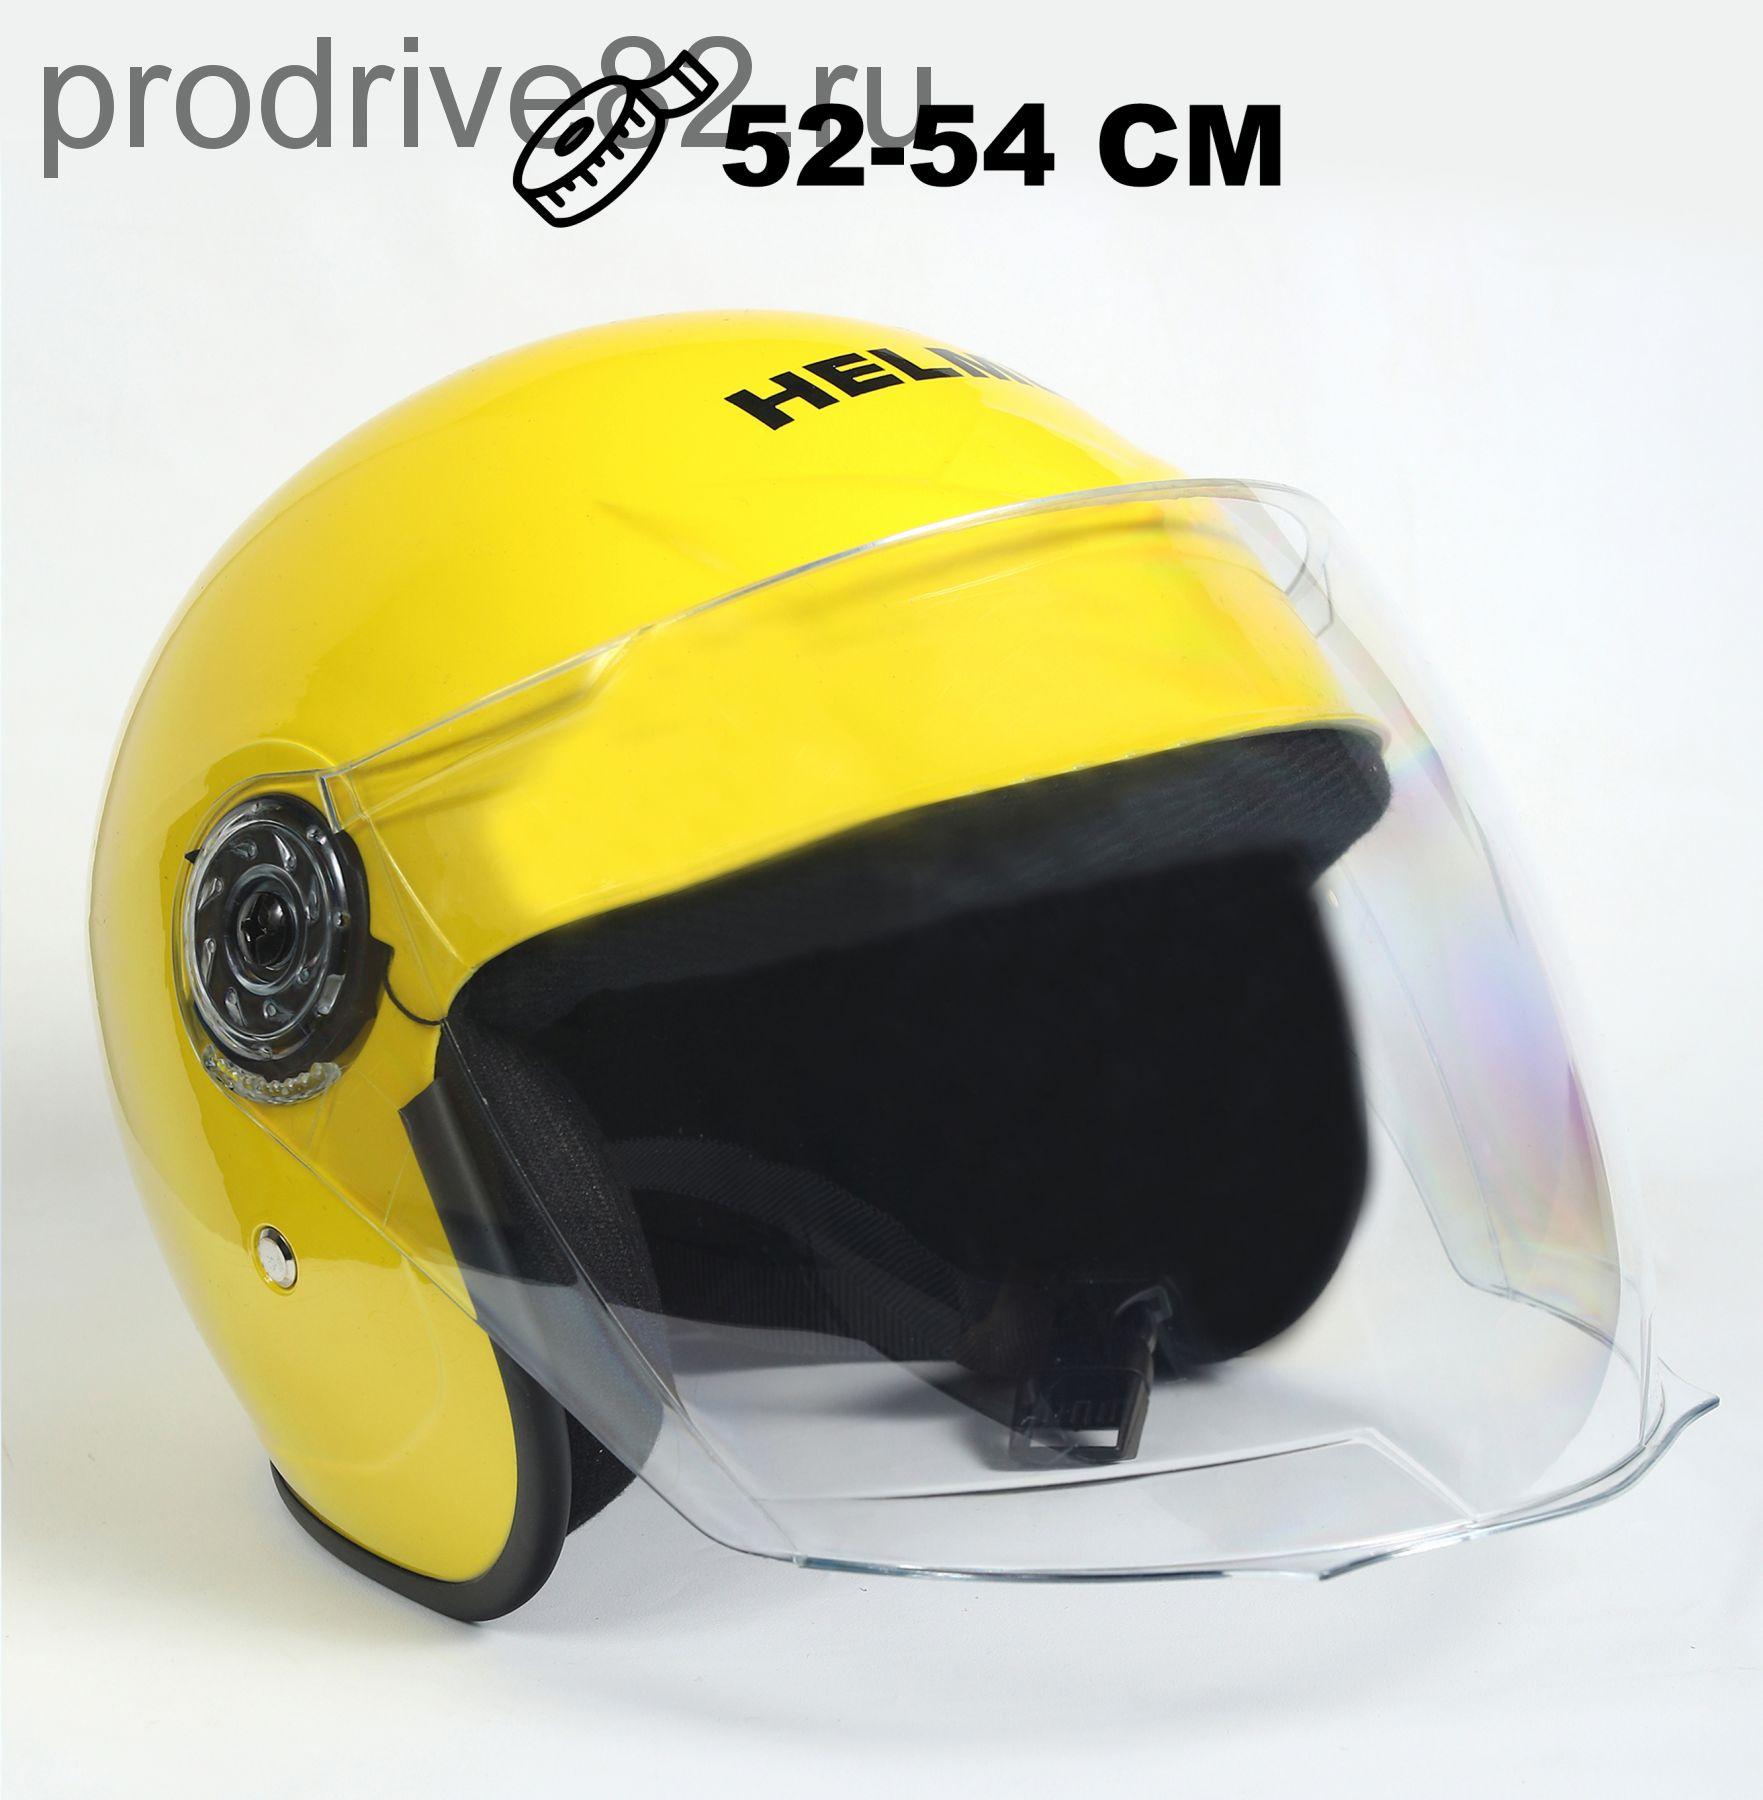 Шлем детский открытый Helmo Yellow